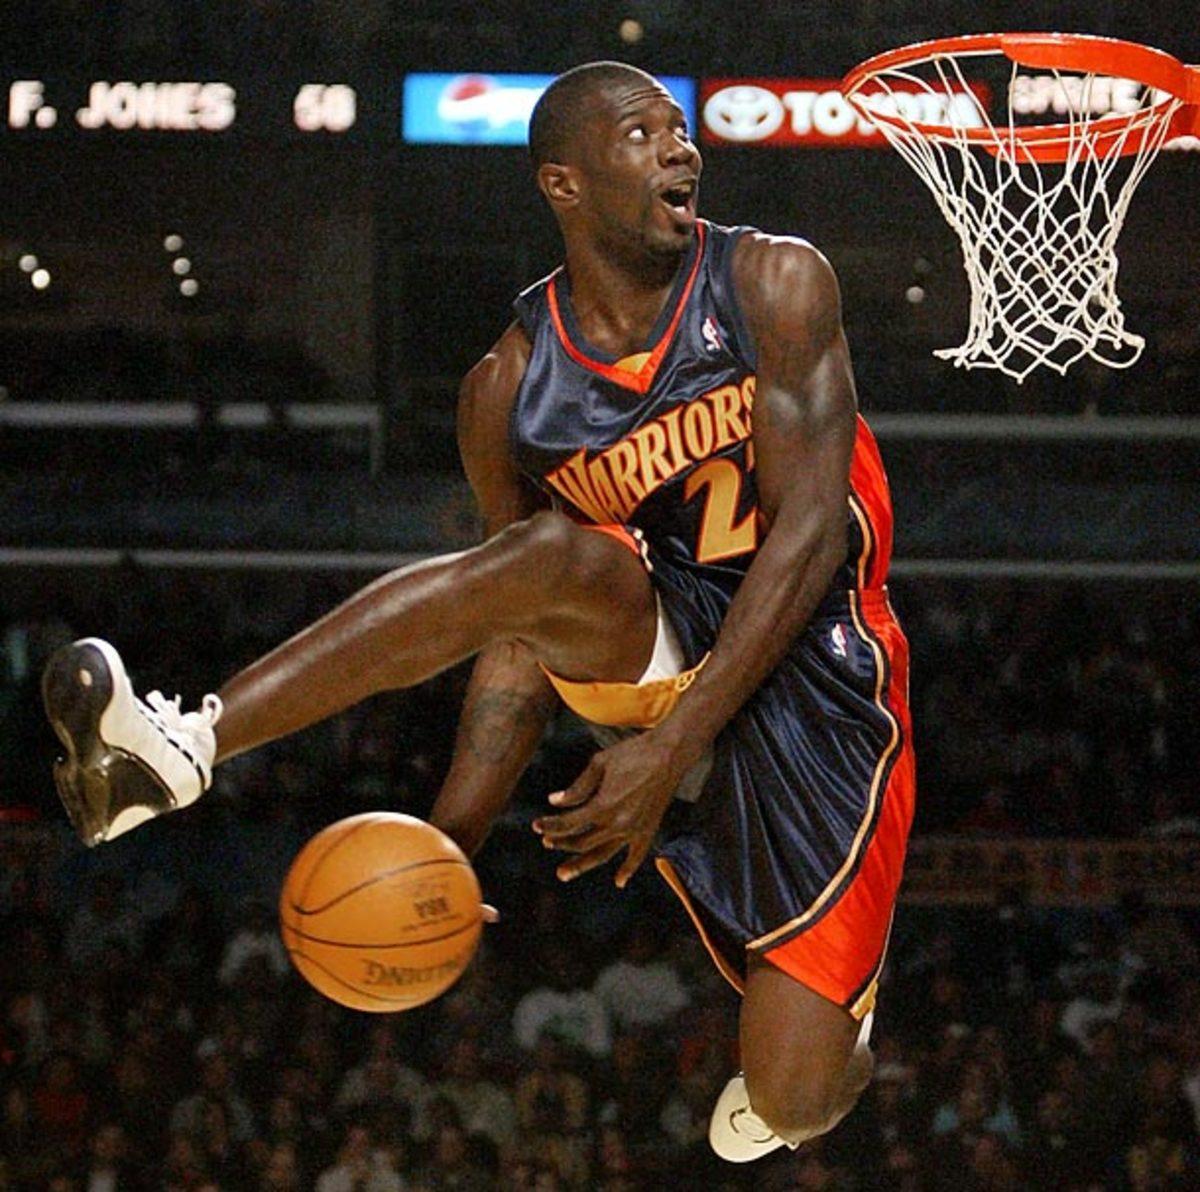 Not even Jason Richardson could redeem the 2004 dunk contest. (Kevork Djansezian/AP)